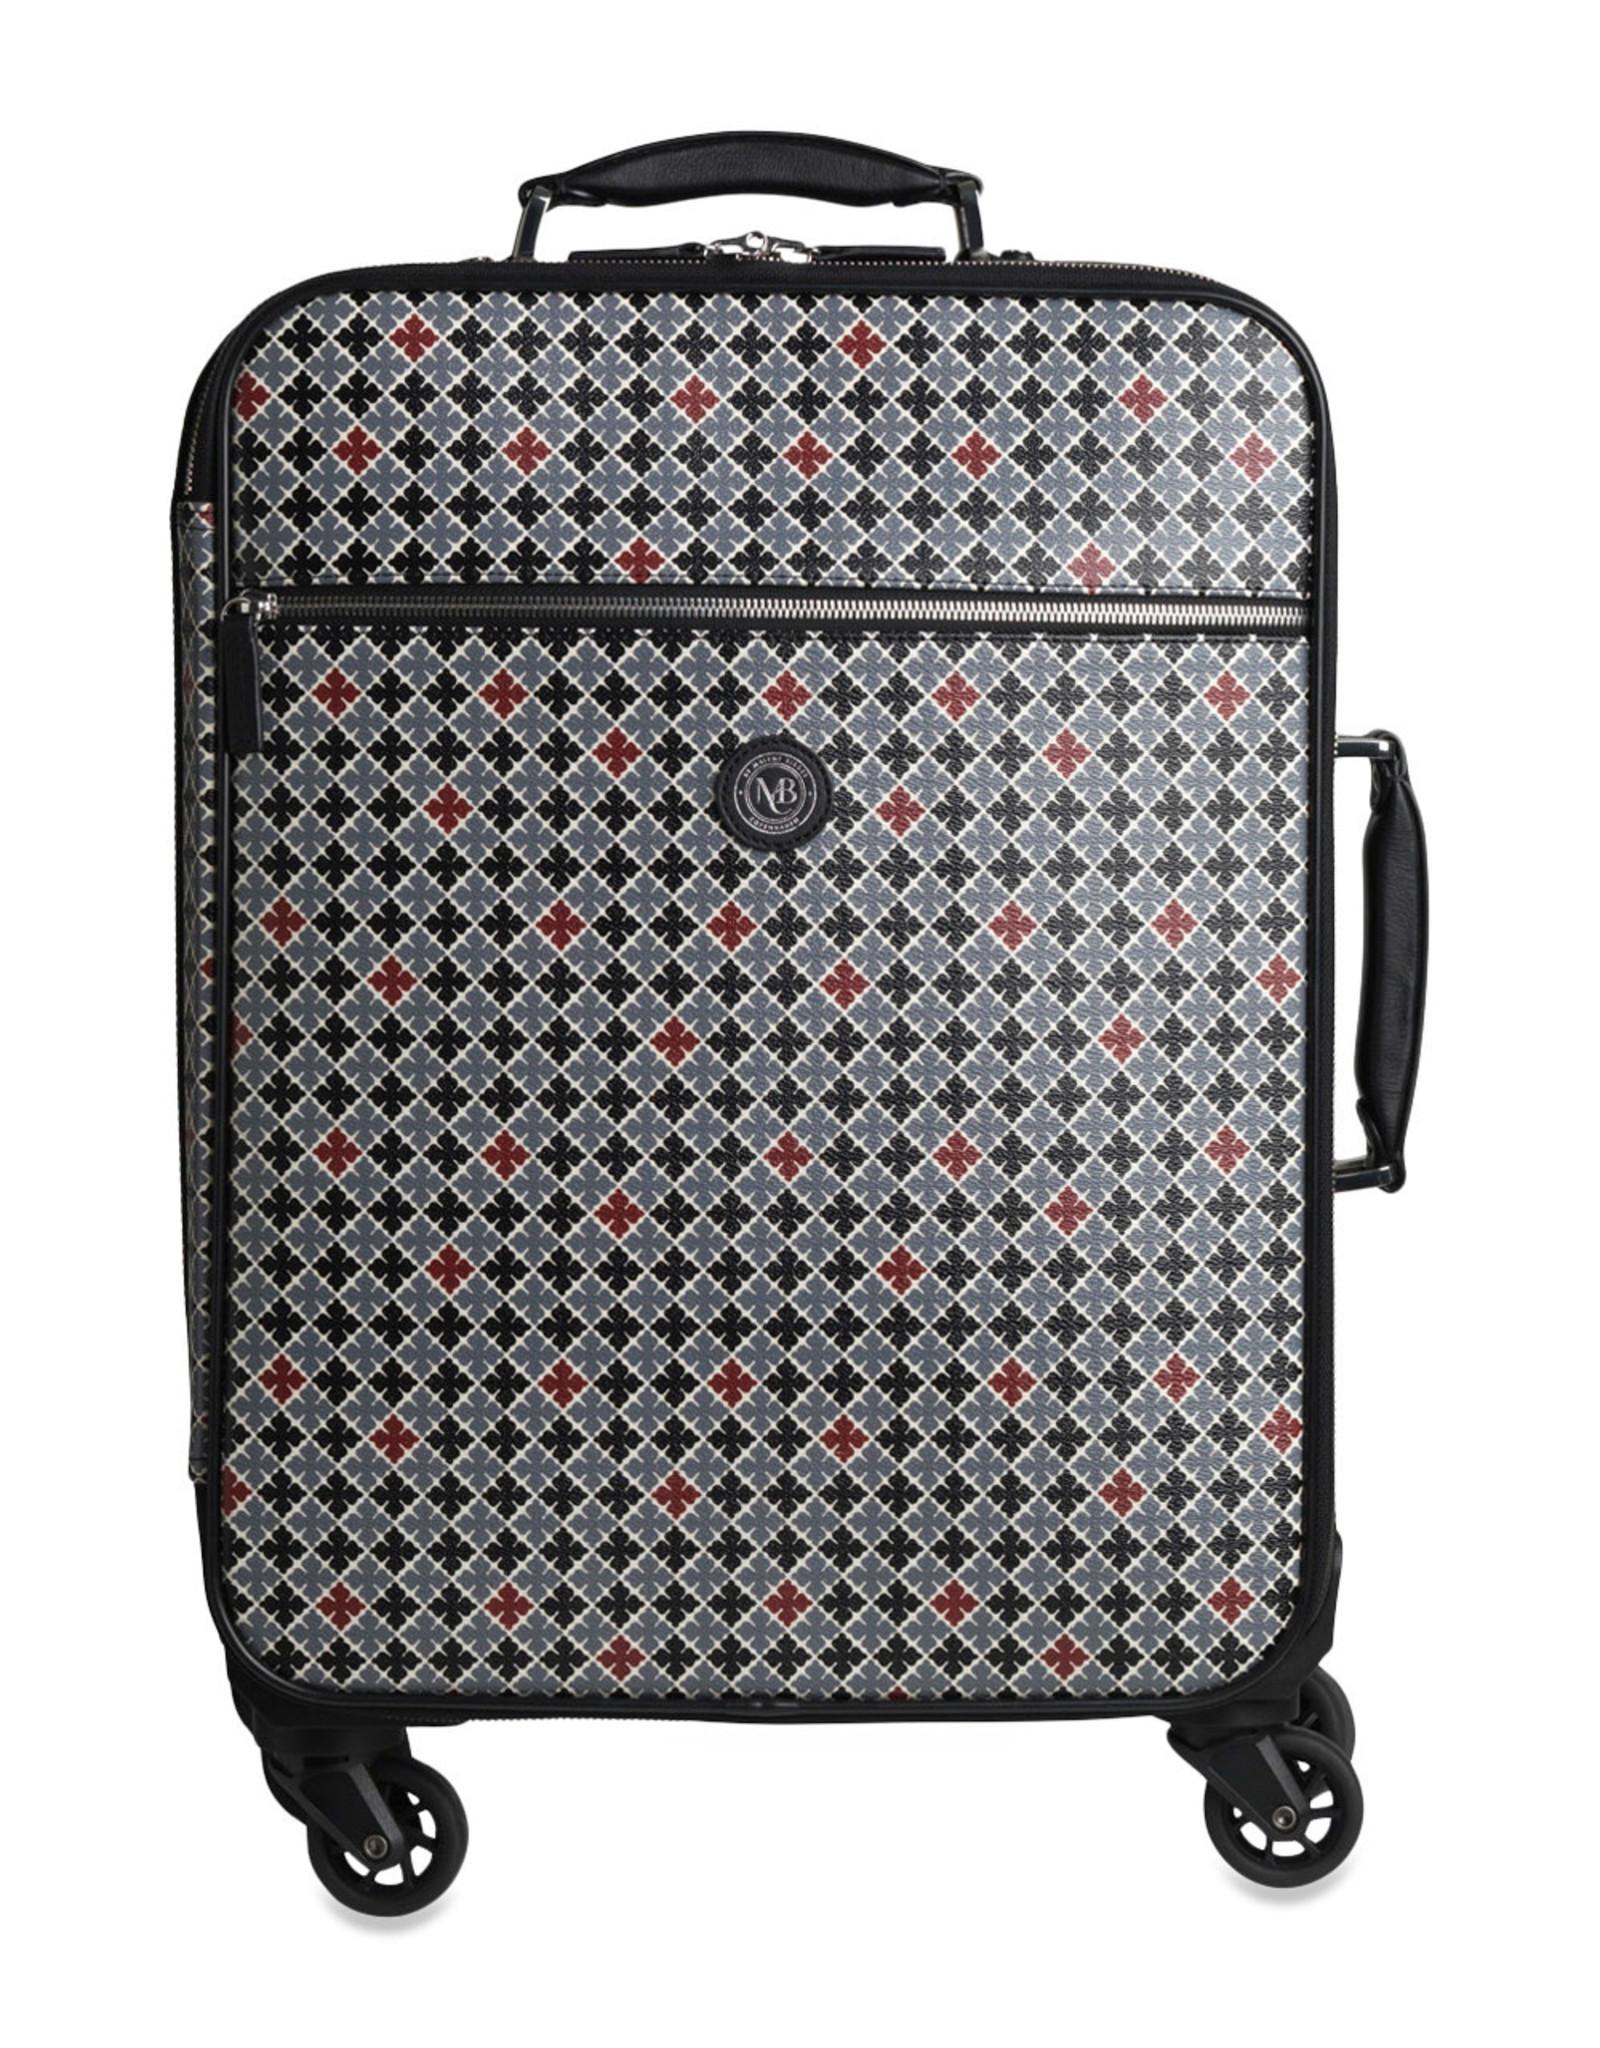 BY MALENE BIRGER The Raniero Suitcase